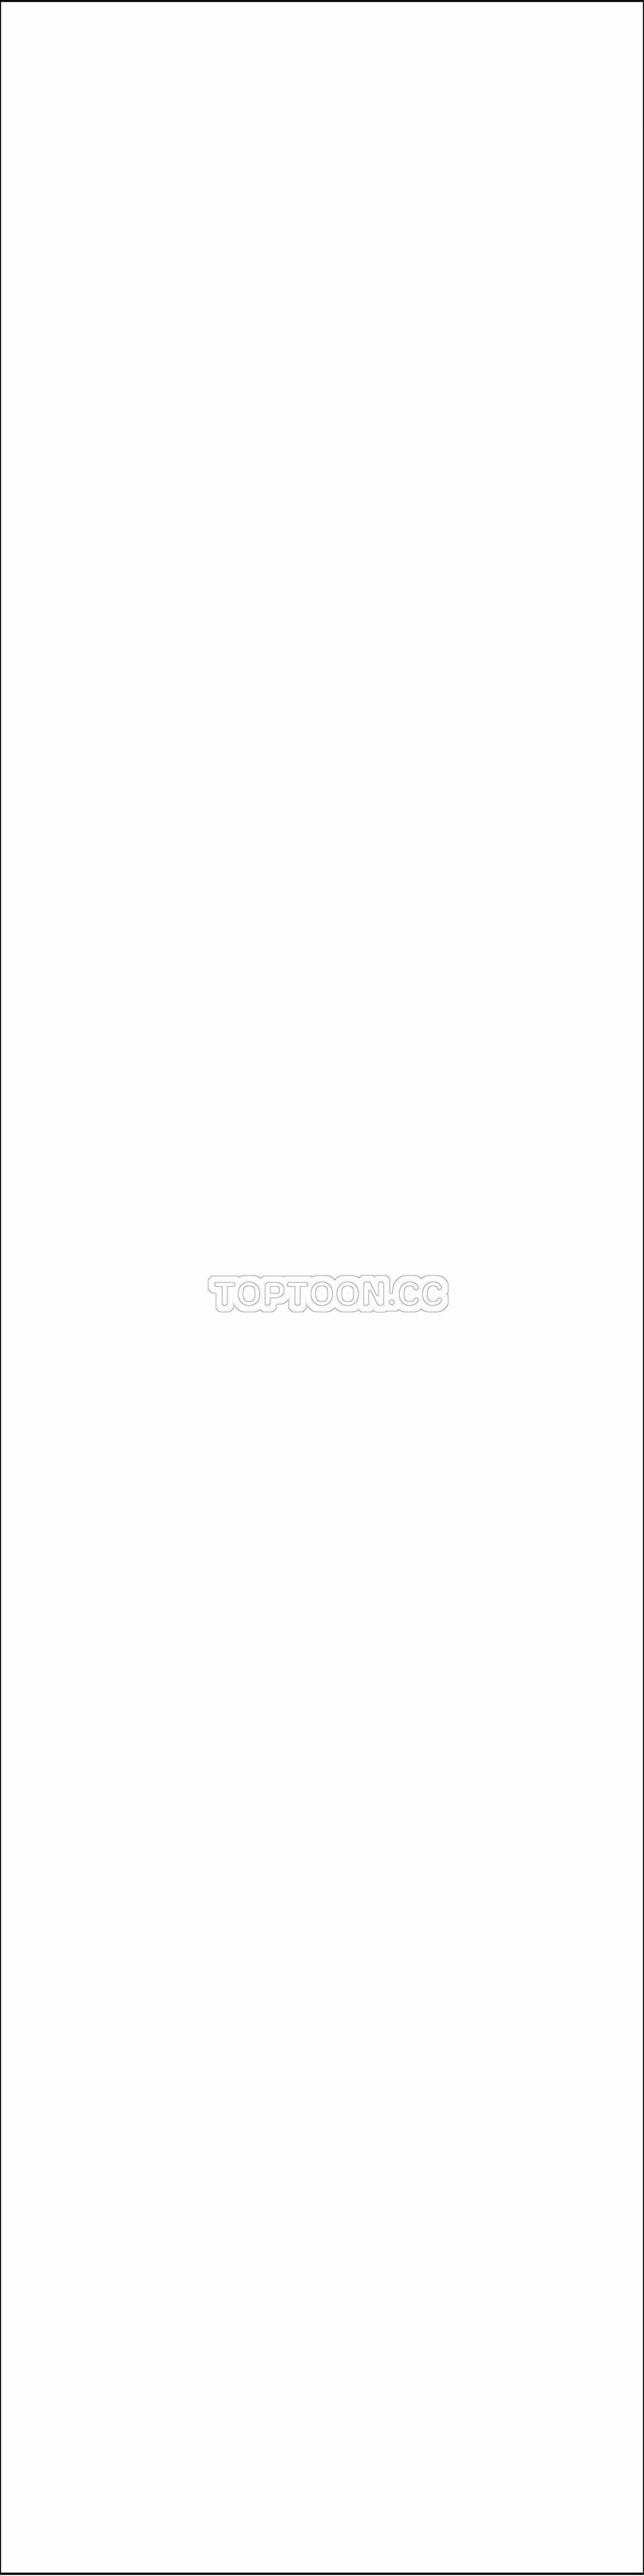 [Studio Wannabe] Rental Girls | 出租女郎 Ch. 33-58 [Chinese]  第二季 完结 218